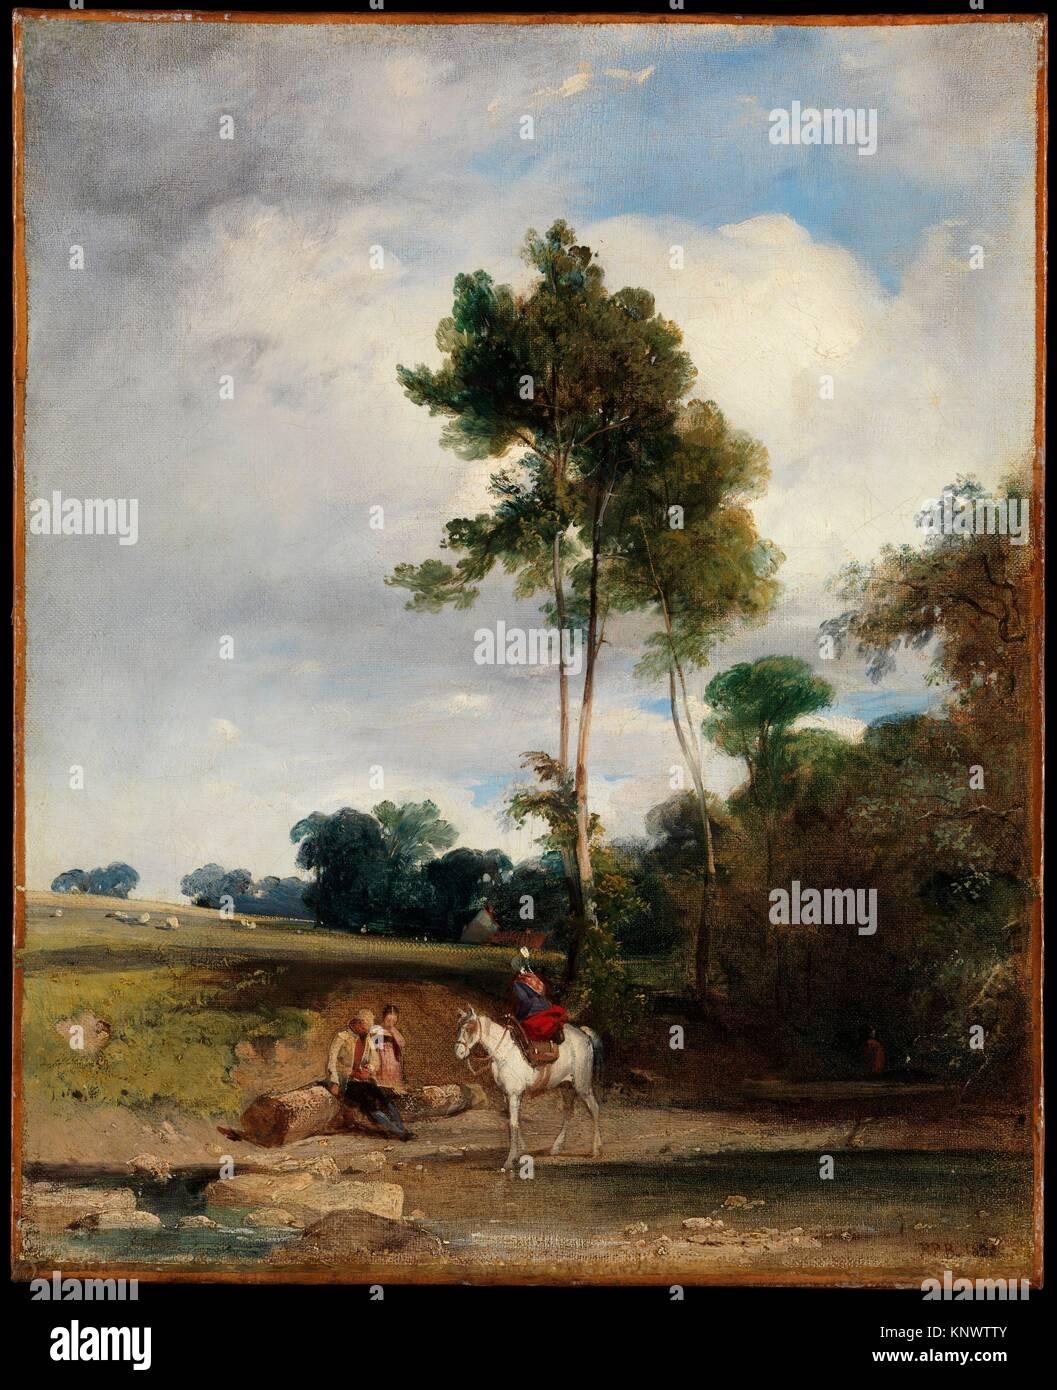 Roadside Halt. Artist: Richard Parkes Bonington (British, Arnold, Nottinghamshire 1802-1828 London); Date: 1826; - Stock Image